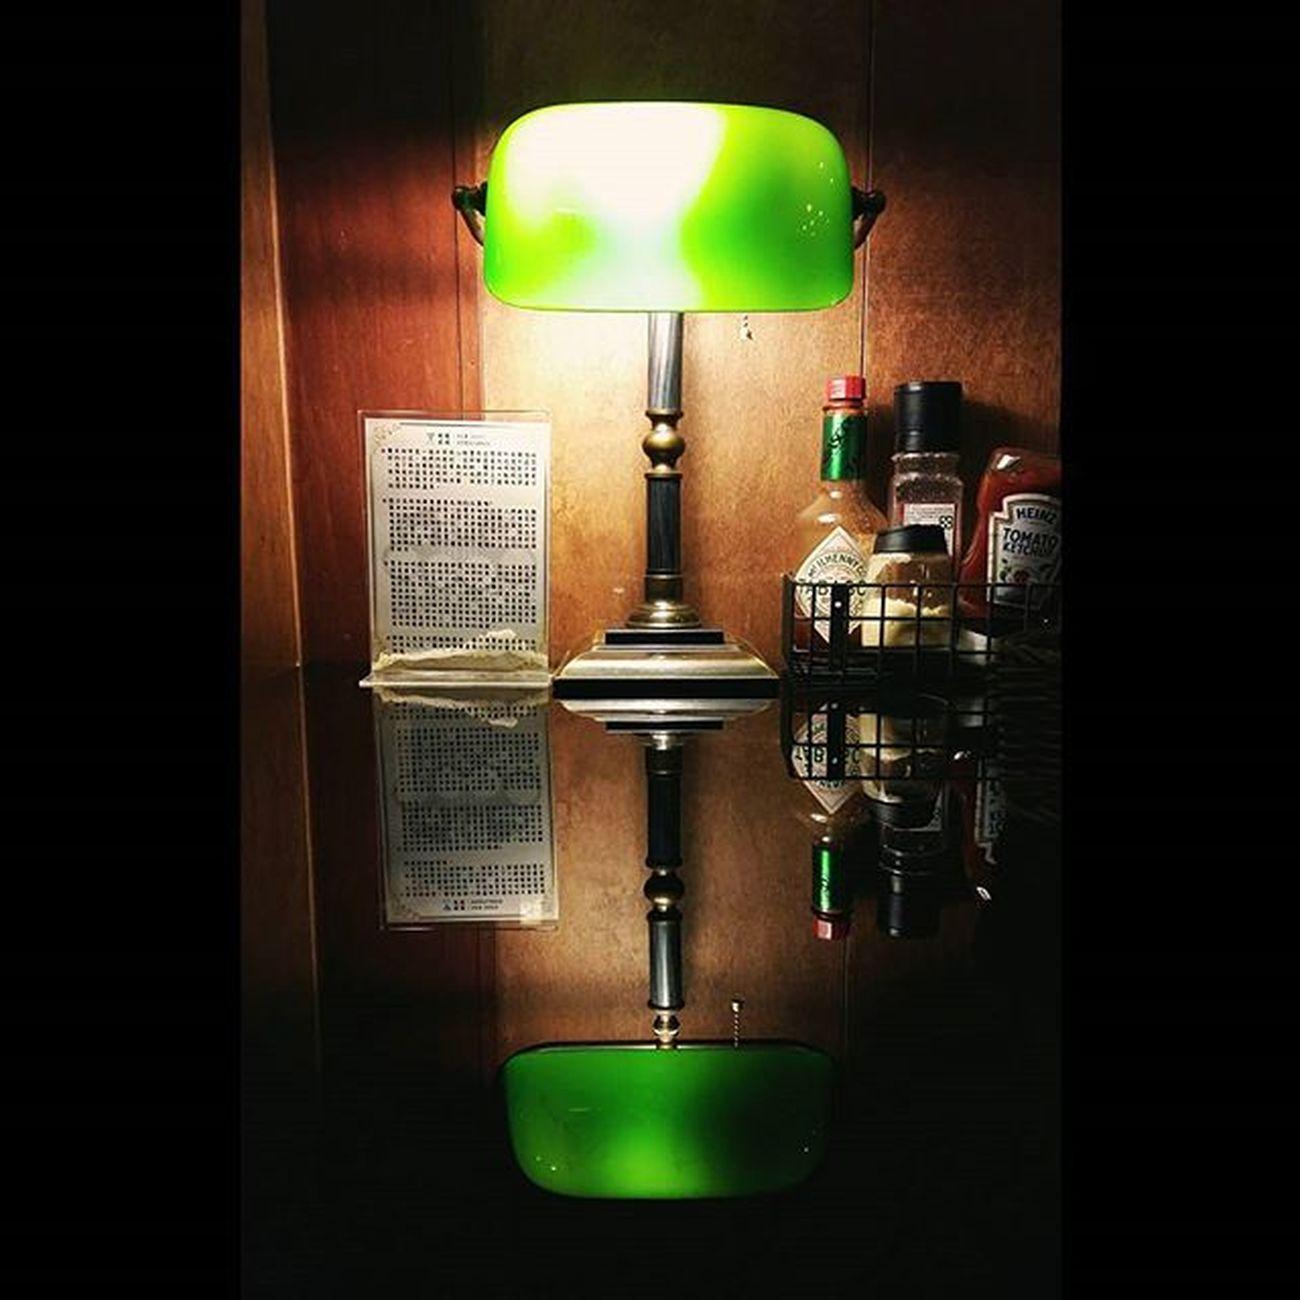 【Banker's Lamp (Emeralite) 】 The first patent for a banker's lamp was filed on 11May 1901 by Harrison D. McFaddin and were produced and sold. 非常經典的銀行家檯燈 1901年被設計出來 特別是翡翠綠的燈罩 讓人難以忘懷... 平常都是從電影上看到 就在上次颱風天回花蓮 進去了一間餐廳 名叫【驚奇咖啡】 觀察店內擺設的同時 看到桌上這個經典的檯燈 燈罩打出來的翡翠綠光 搭配後面的木板 有如寶石般的華麗 也感受到濃濃的美式復古味 裡面看到了好多很有味道的擺設 每個角落都突顯了老闆的品味 有機會到花蓮市可以進去品嚐☕ Banker Lamp Bankerslamp Oops 驚奇咖啡 花蓮 檯燈